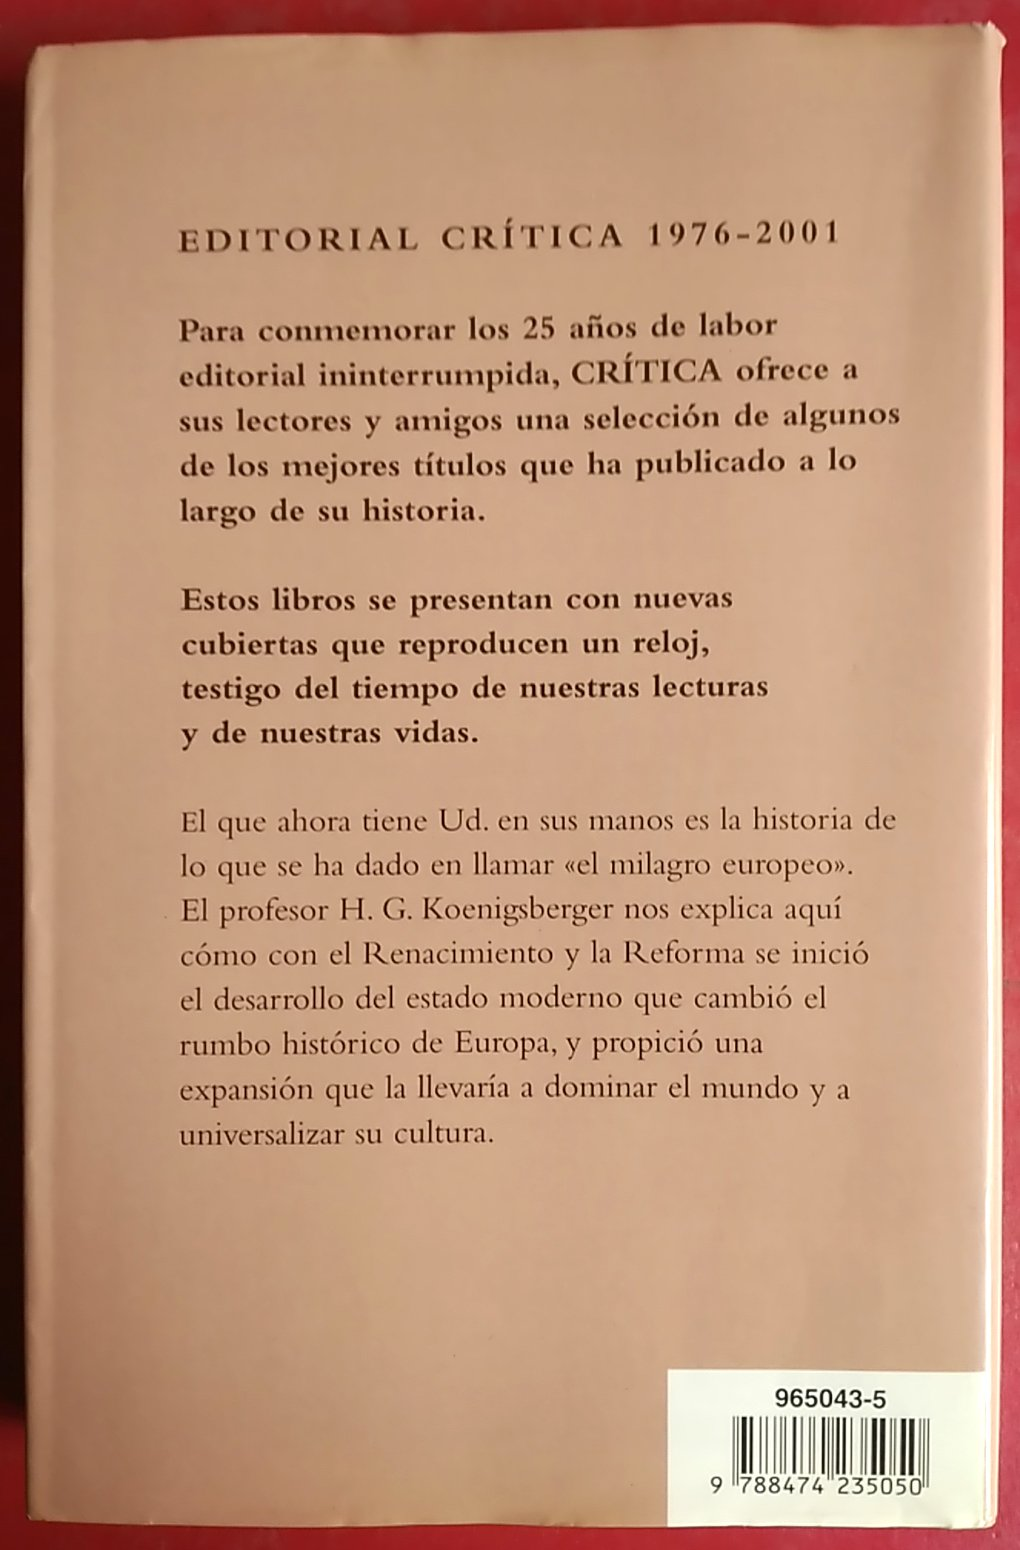 Historia de Europa - El Mundo Moderno 1500-1789 (Spanish Edition): H. G. Koenigsberger: 9788474235050: Amazon.com: Books